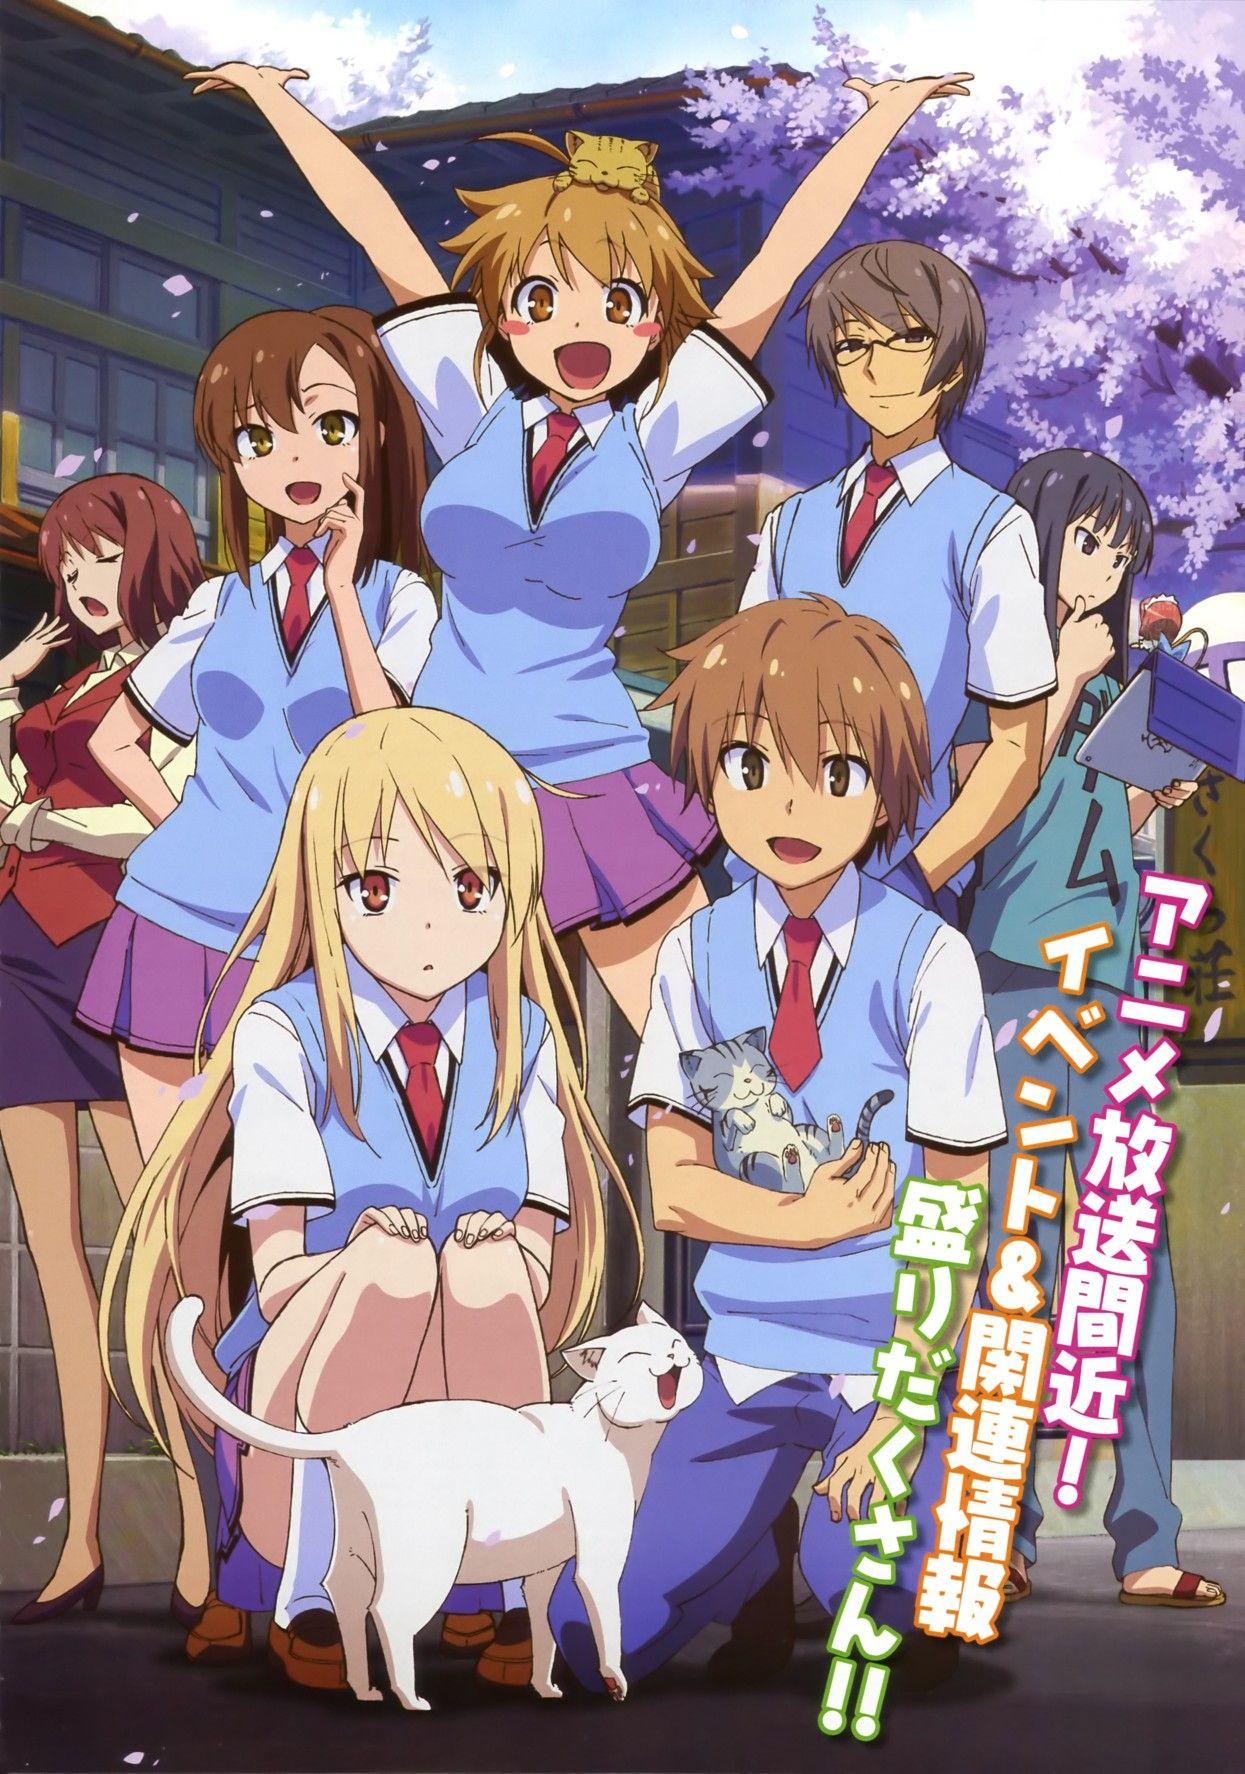 Pin By Hgg Giang On Anime Anime Romance Anime Episodes Anime